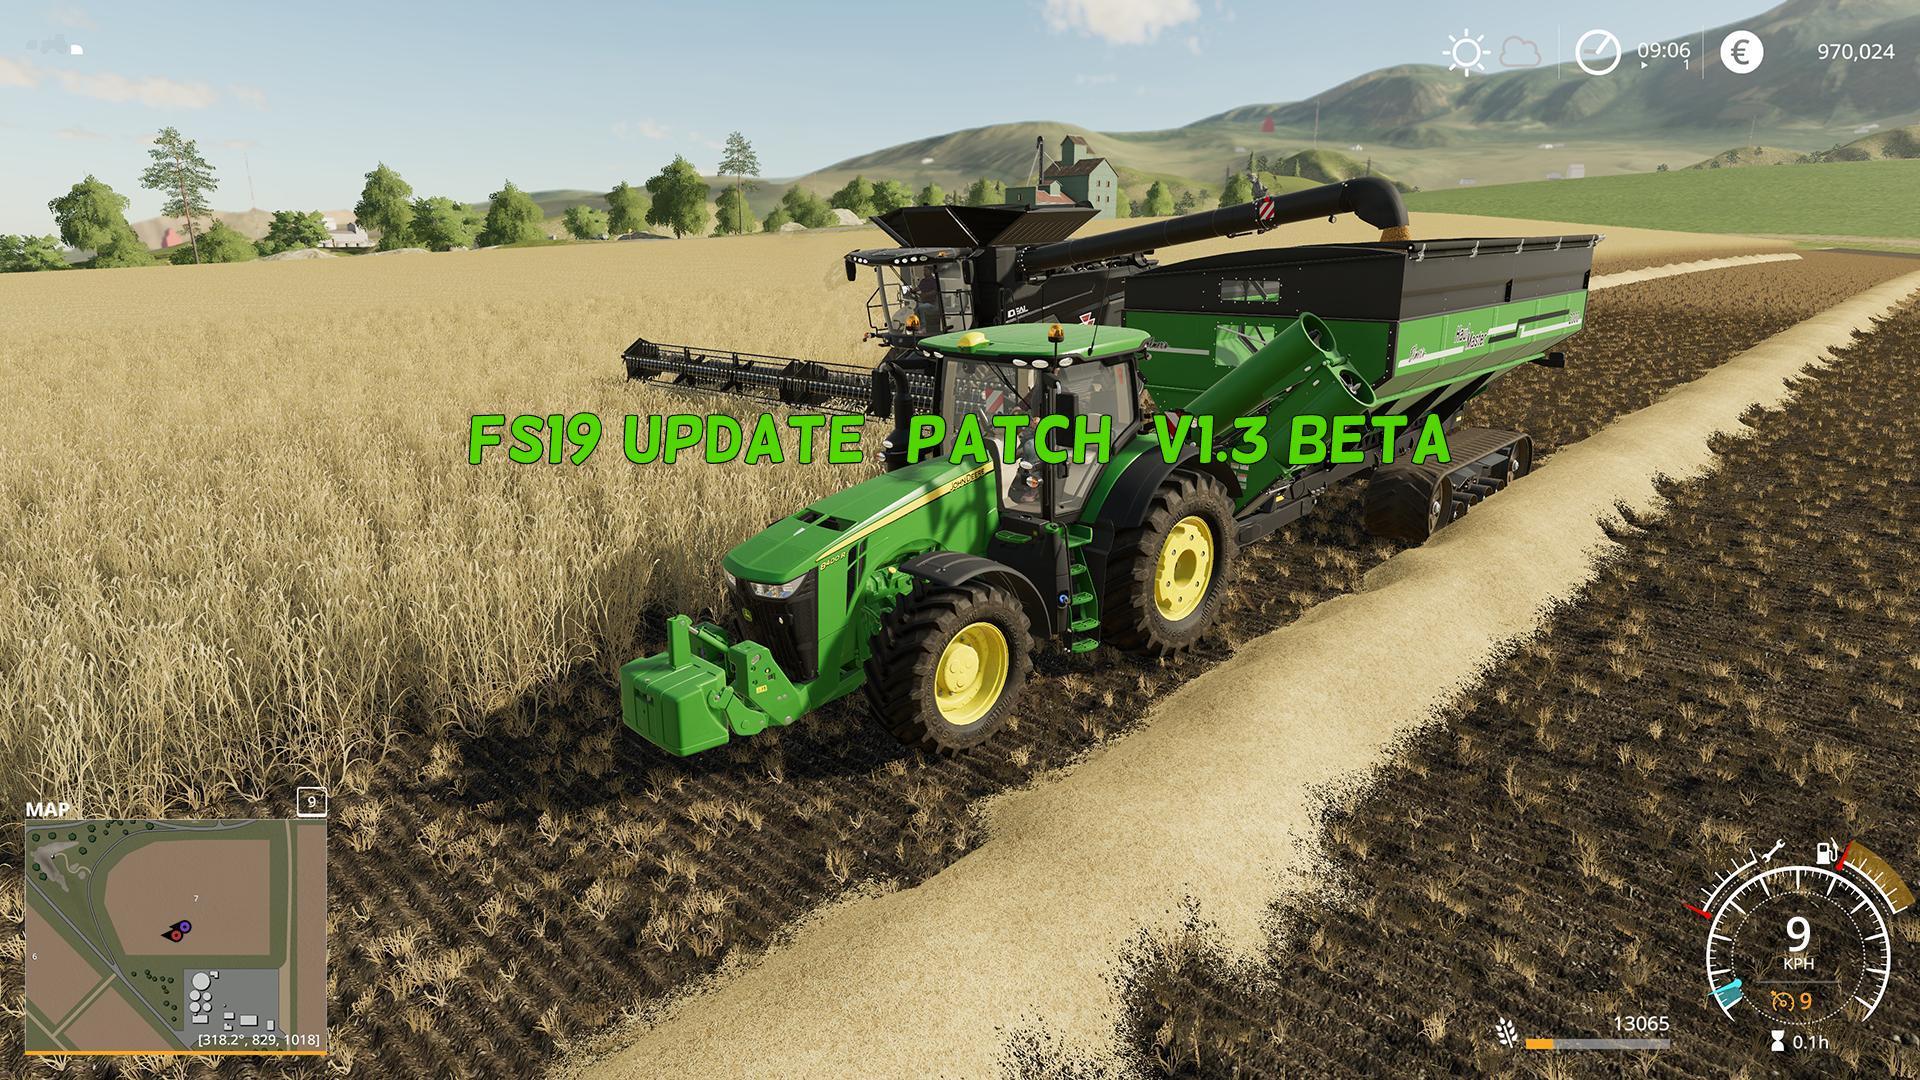 Farming Simulator 19 Update (patch) V1 3 Beta - Farming Simulator 19